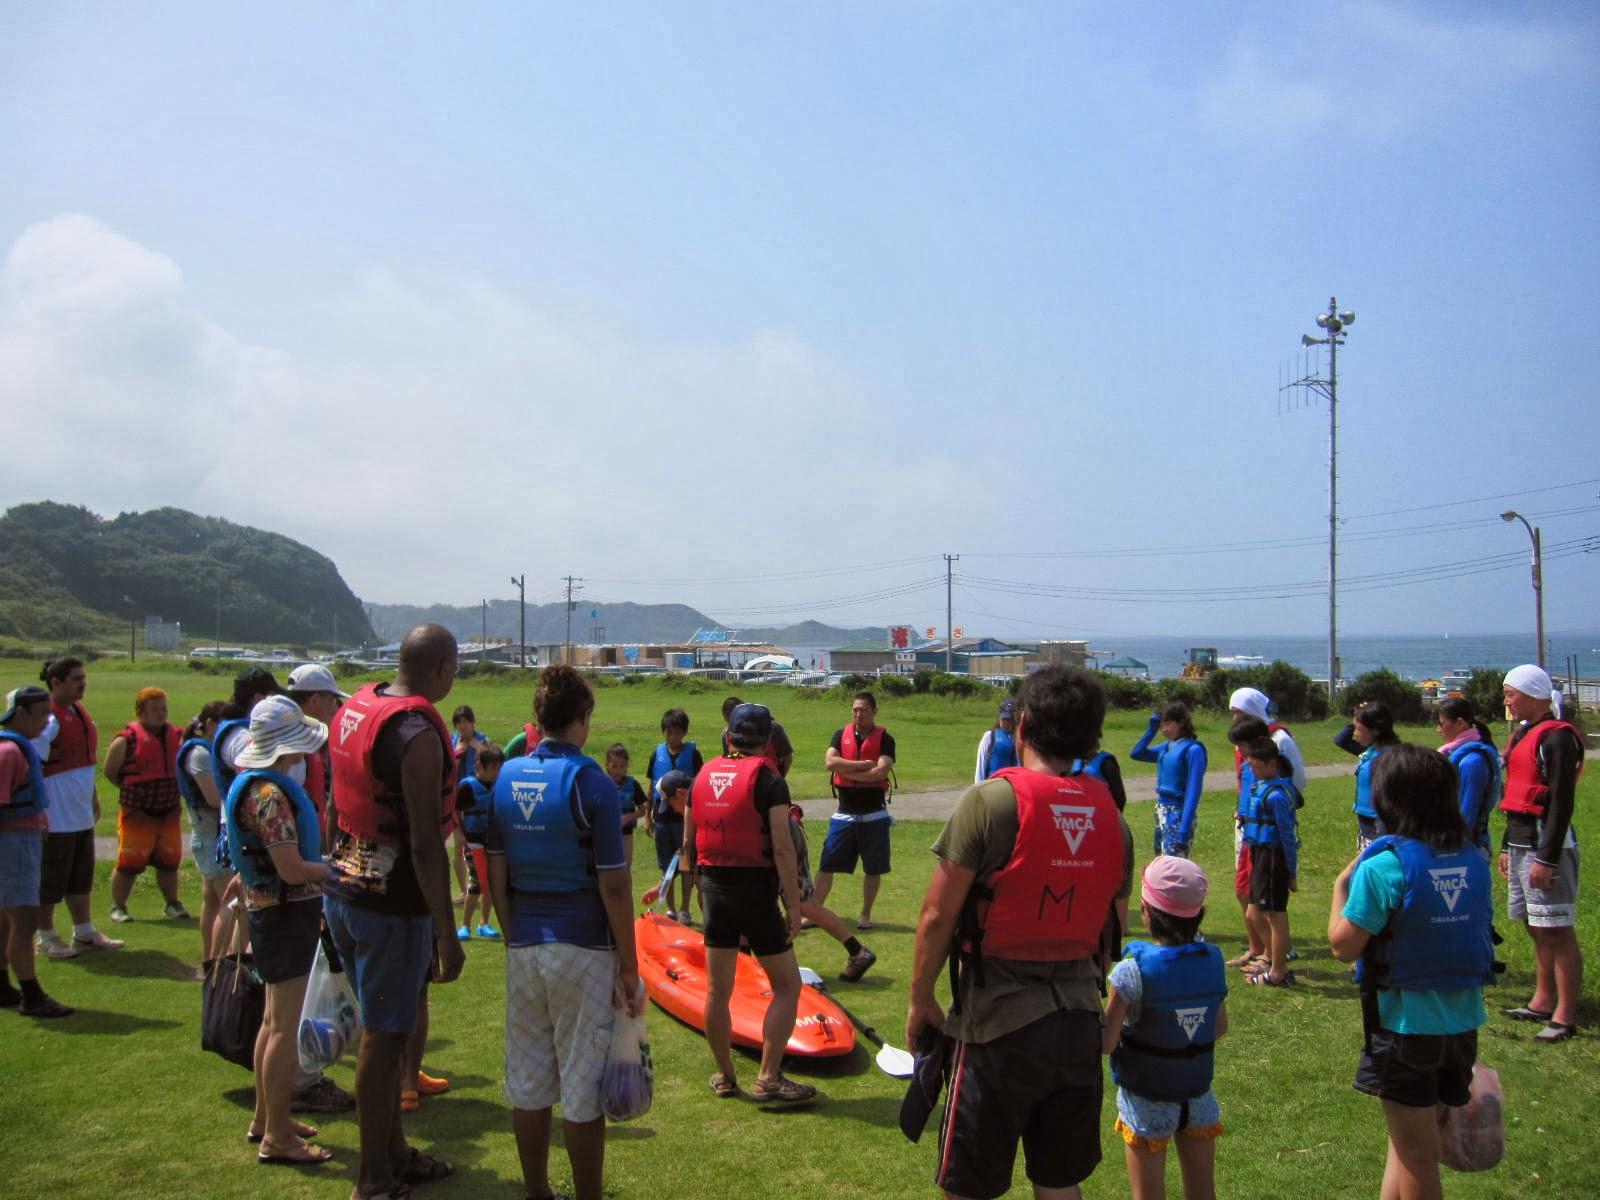 ICCPJ (International Camp Counselor Program in Japan) 國際夏令營志工計畫 - 日本營隊志工